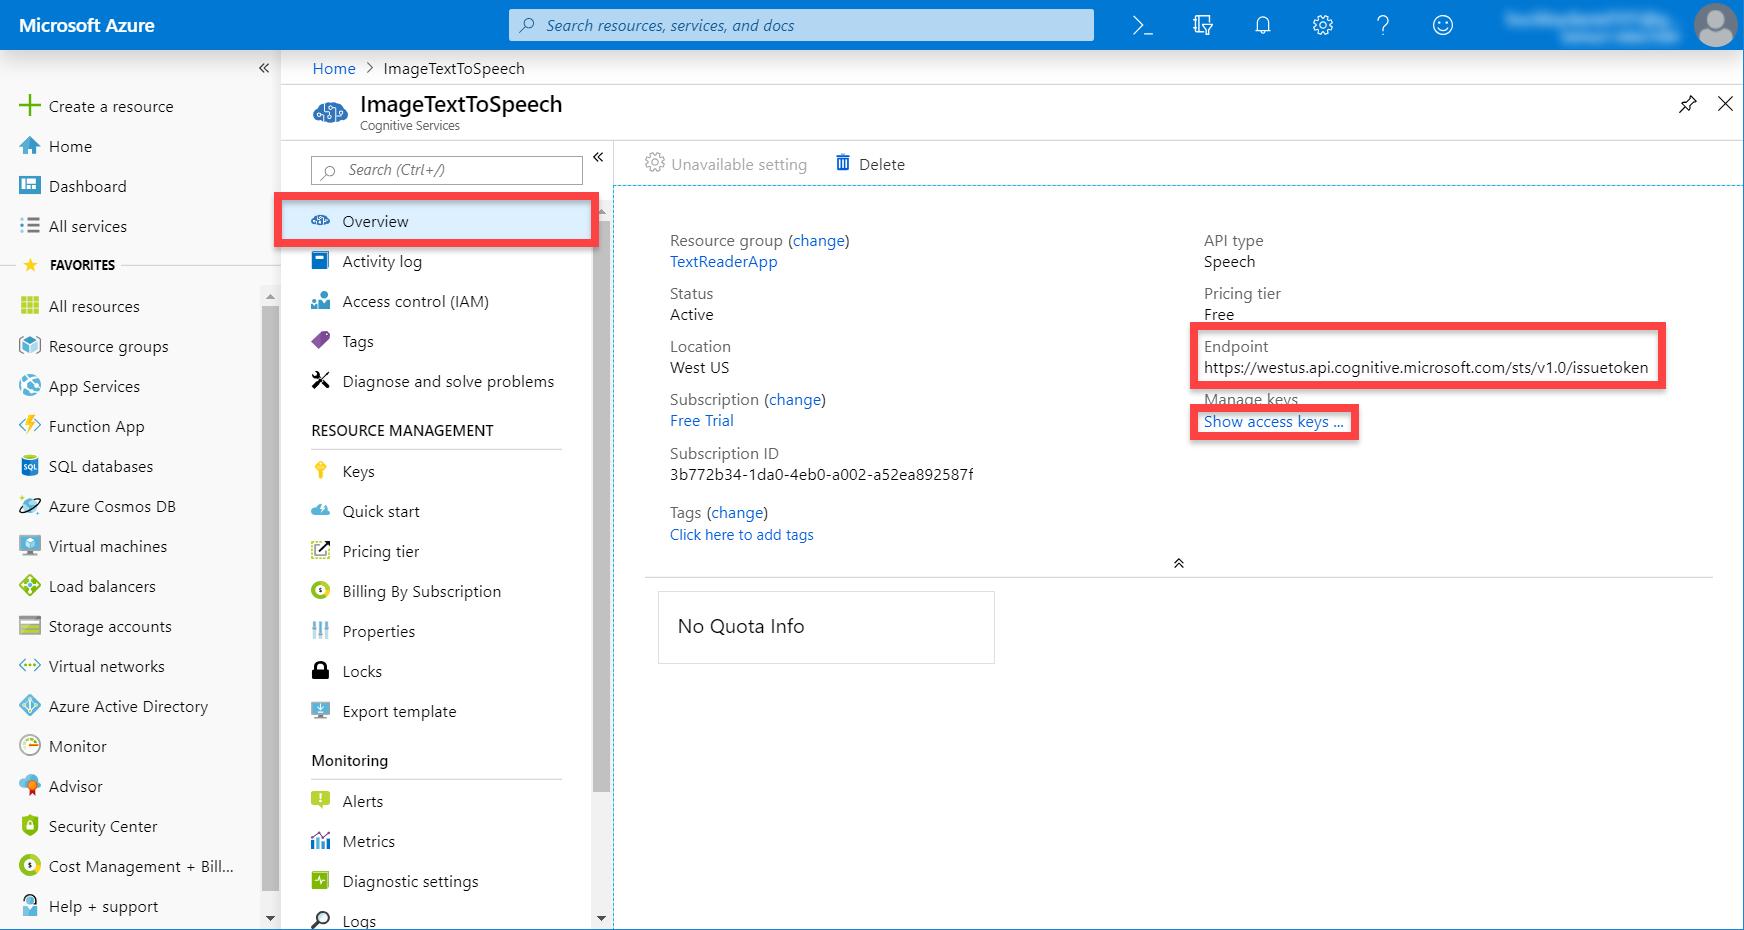 Microsoft Azure ImageTextToSpeech service page